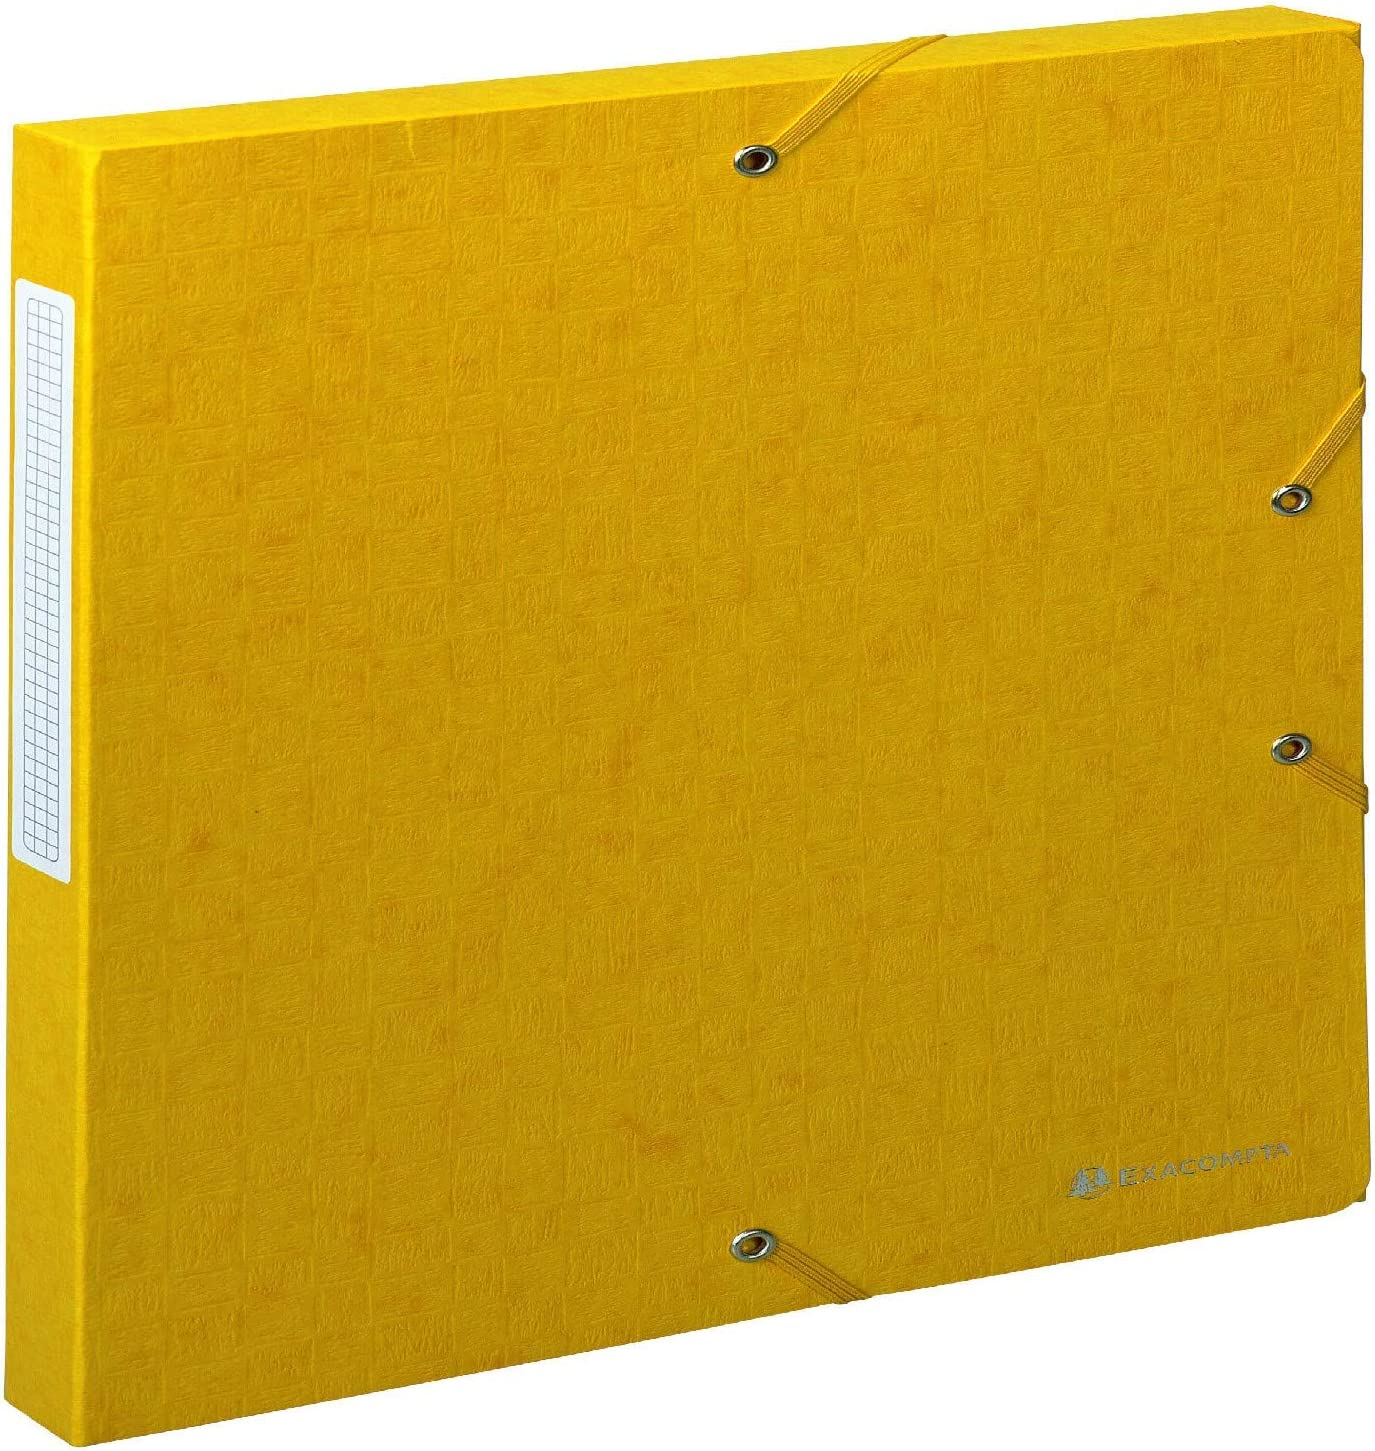 Manila-Karton, R/ückenetikett, R/ücken 25 mm, 600 g, DIN A4 Exacompta 50701E Archivbox 1 St/ück schwarz